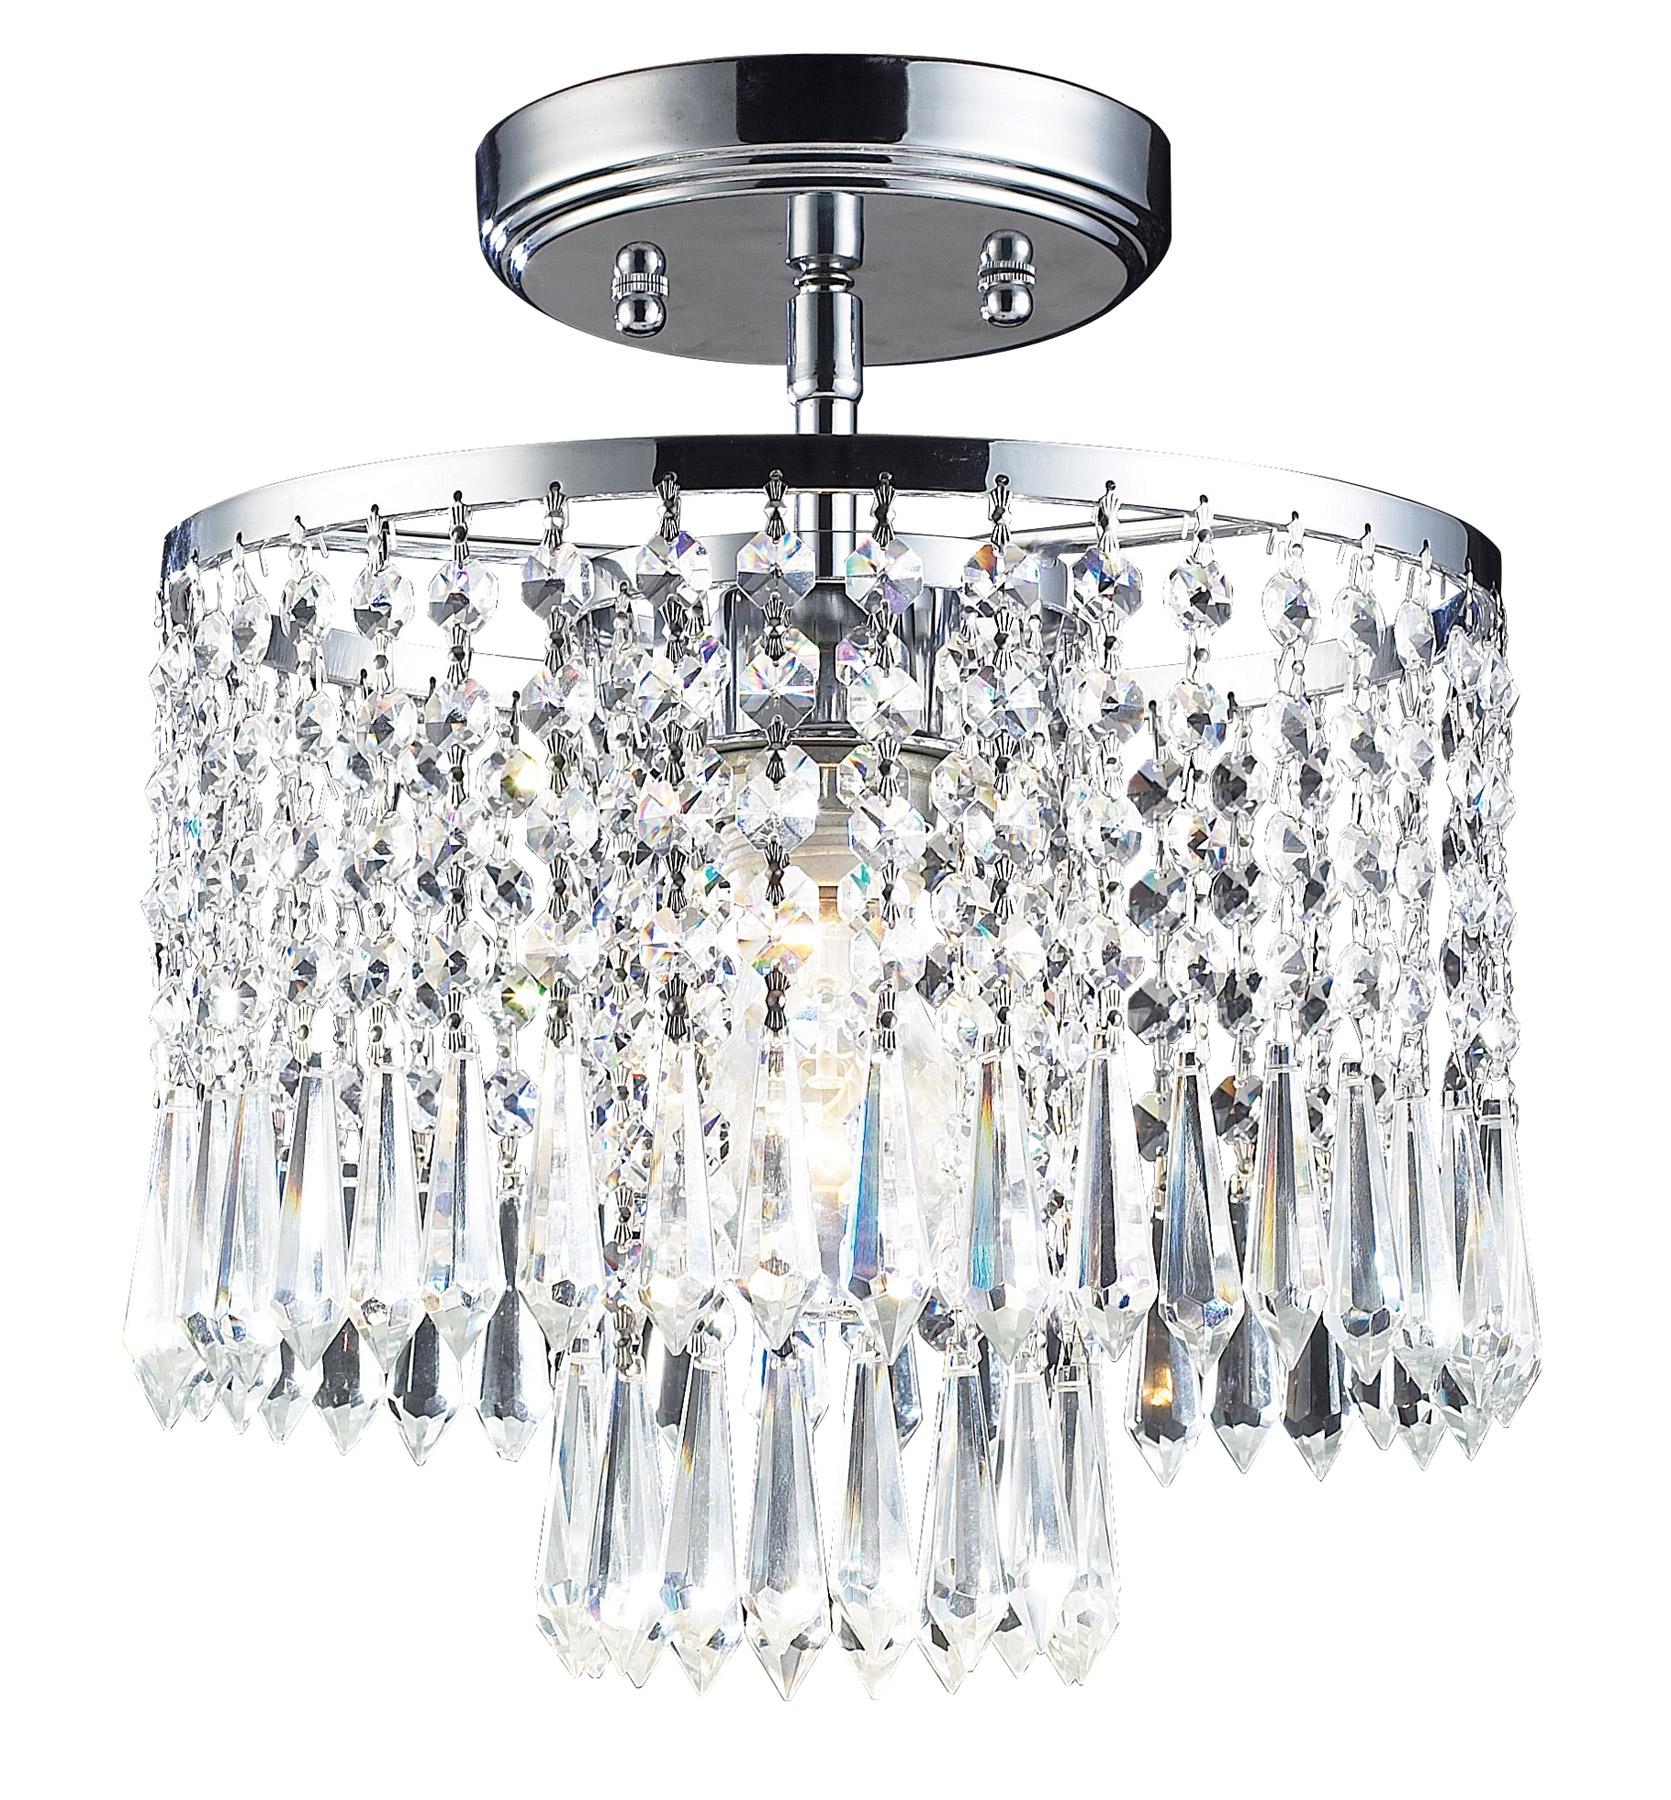 Elk Lighting 1991 1 Crystal Optix Semi Flush Ceiling Fixture